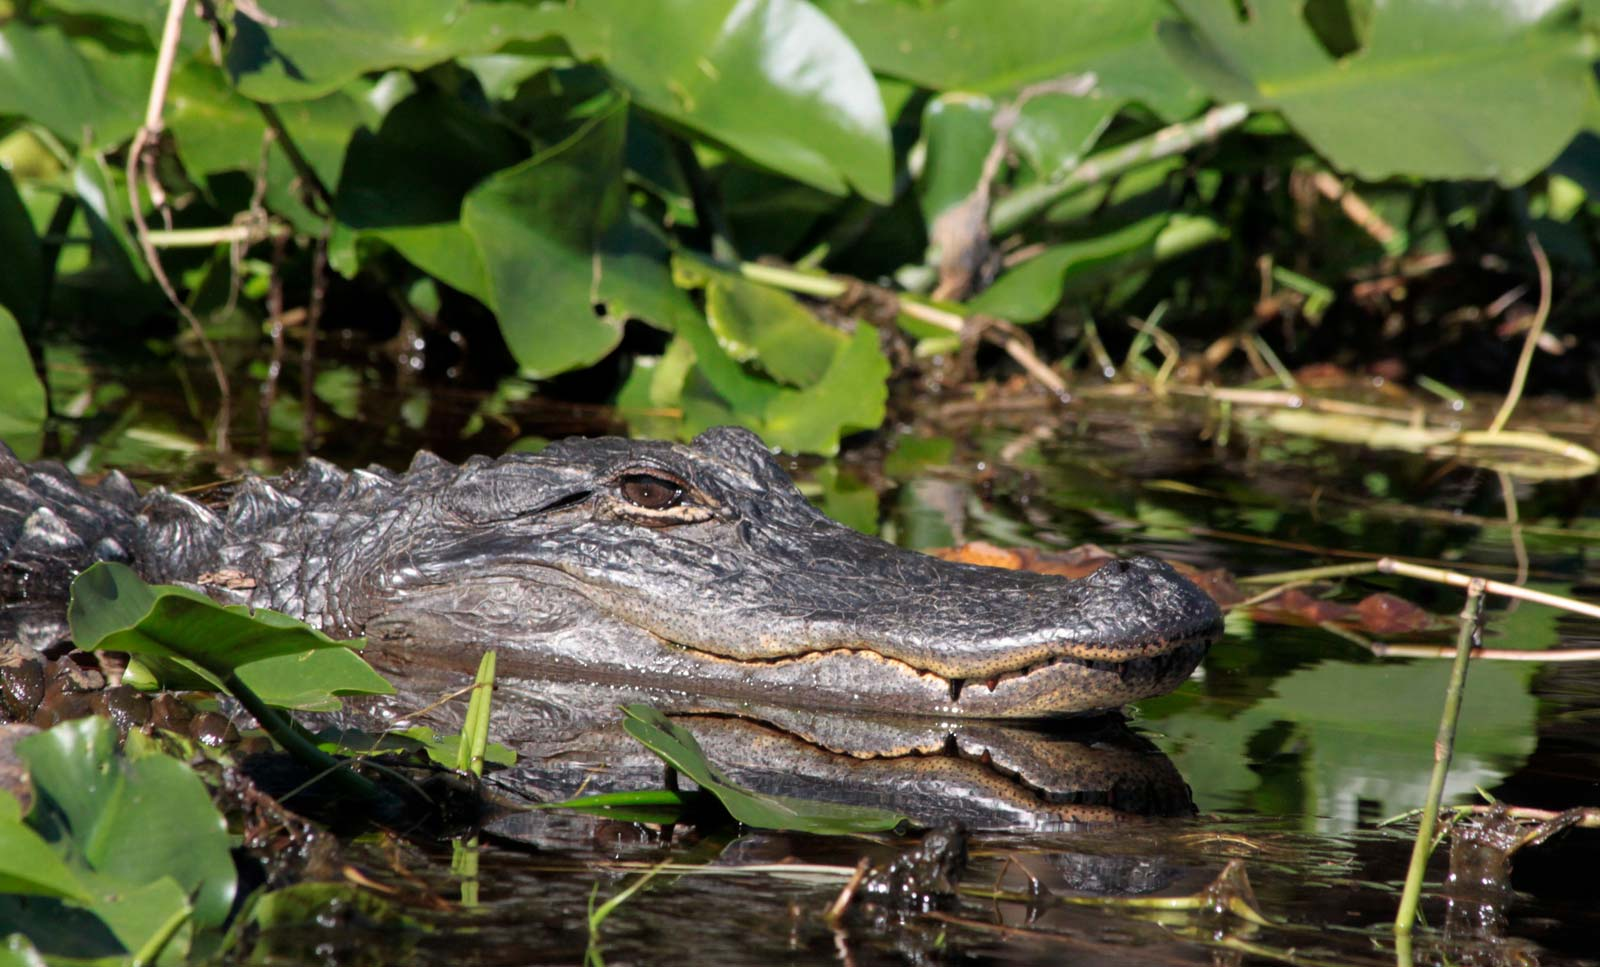 American alligator in Okefenokee Swamp at Stephen C. Foster State Park, Georgia